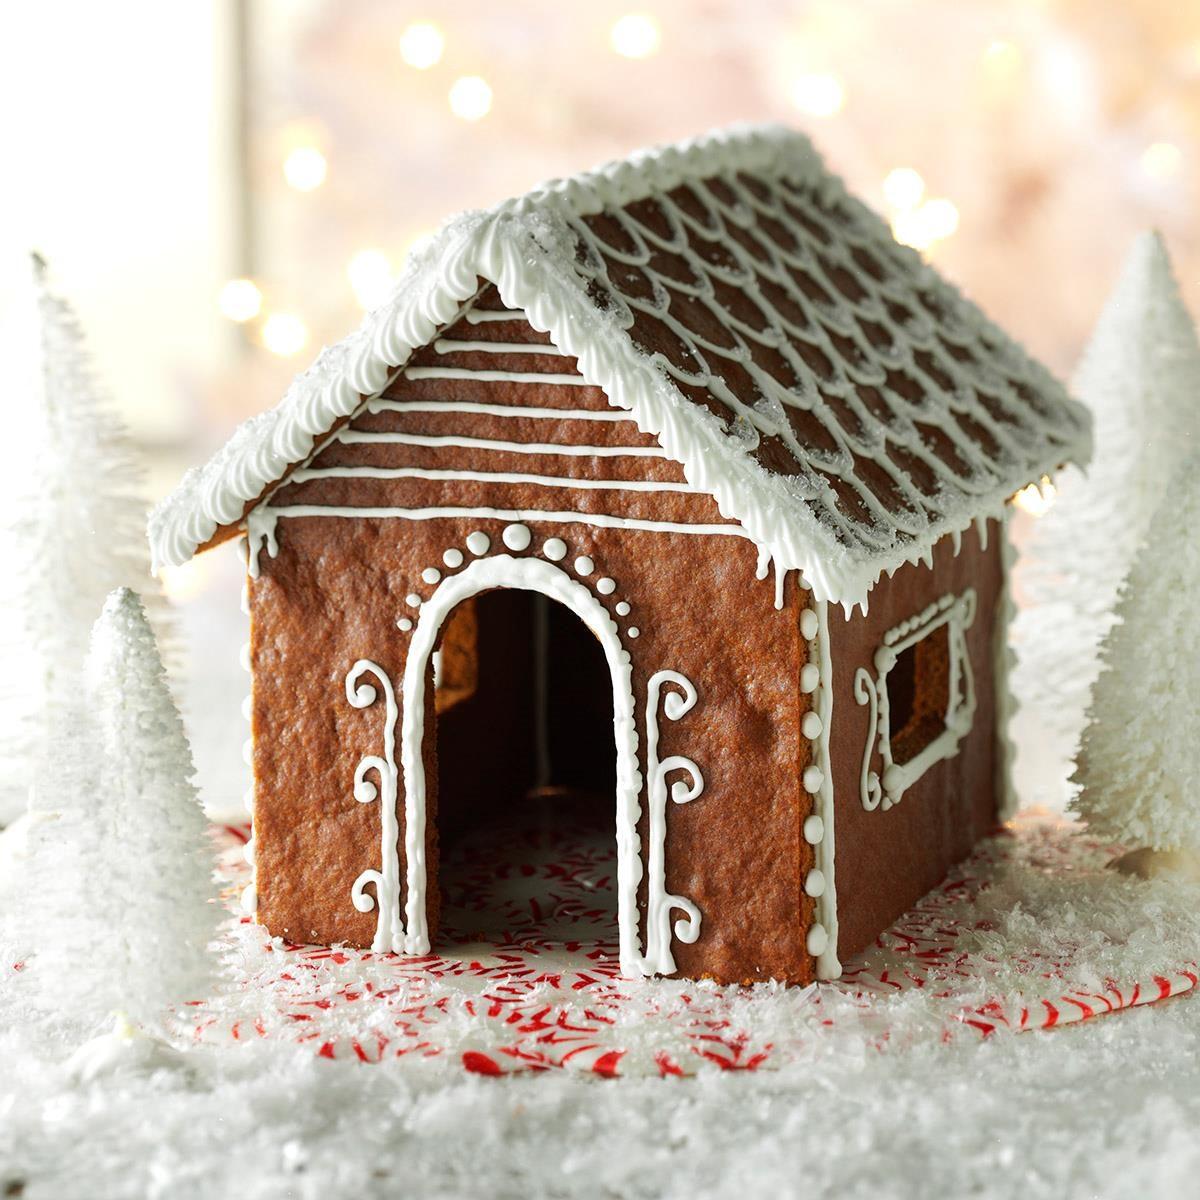 Texas: Gingerbread House